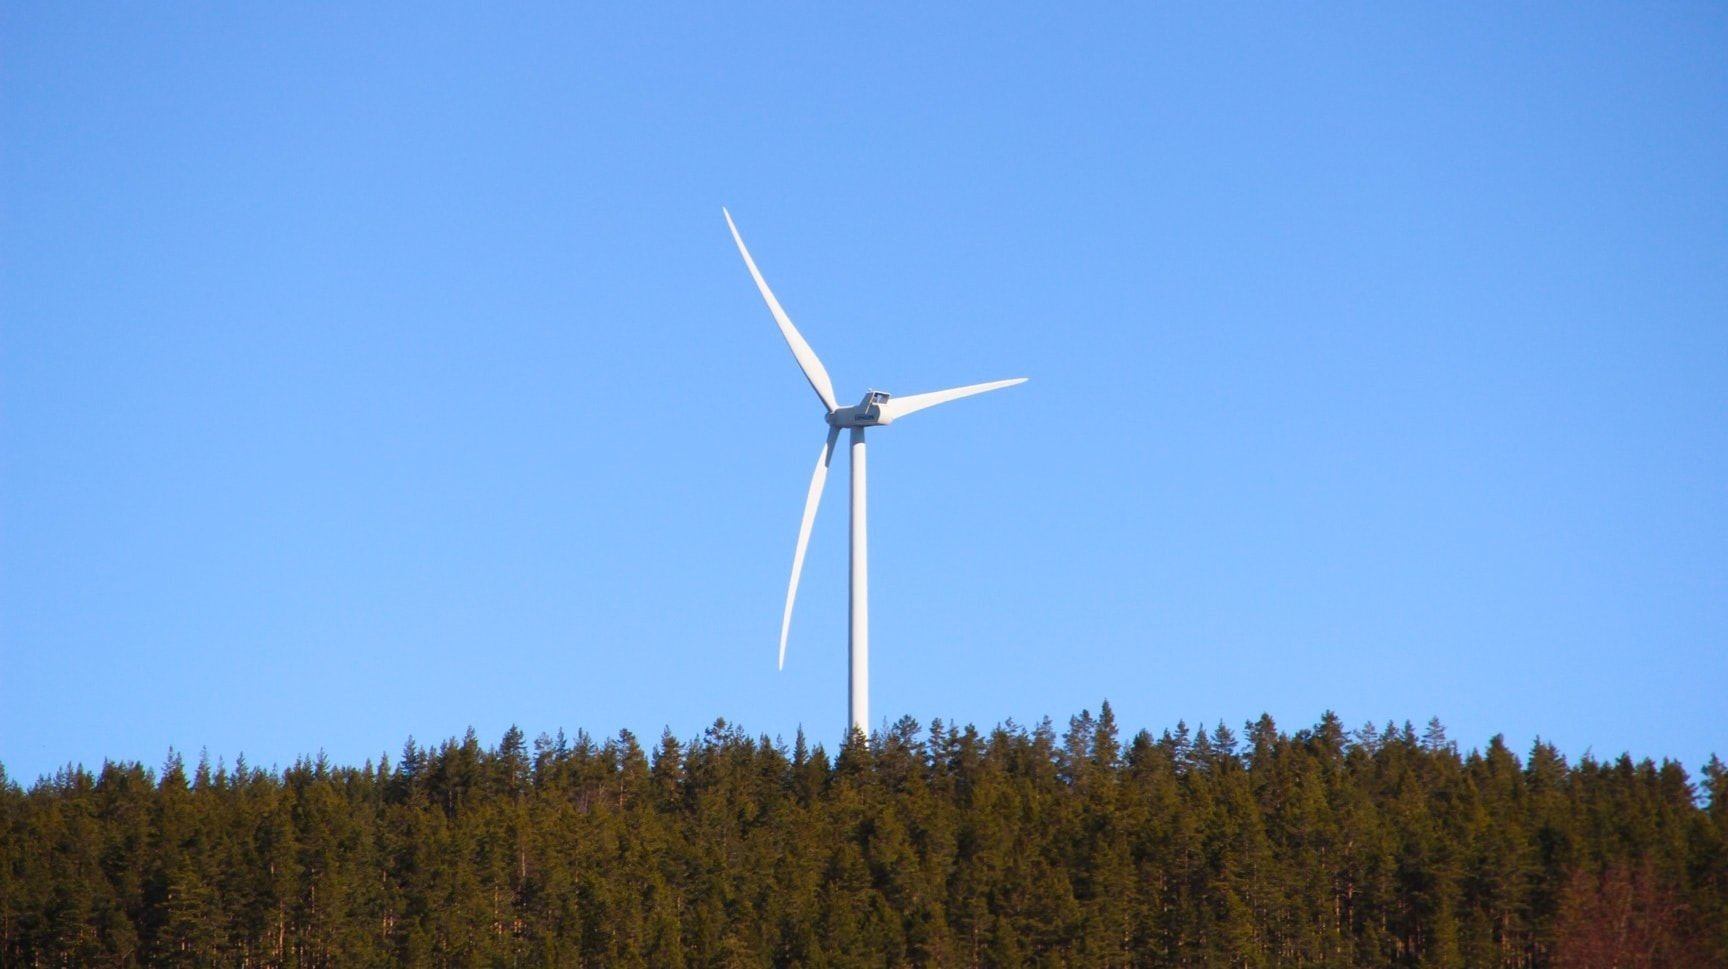 Usa sager ja till vindkraftspark